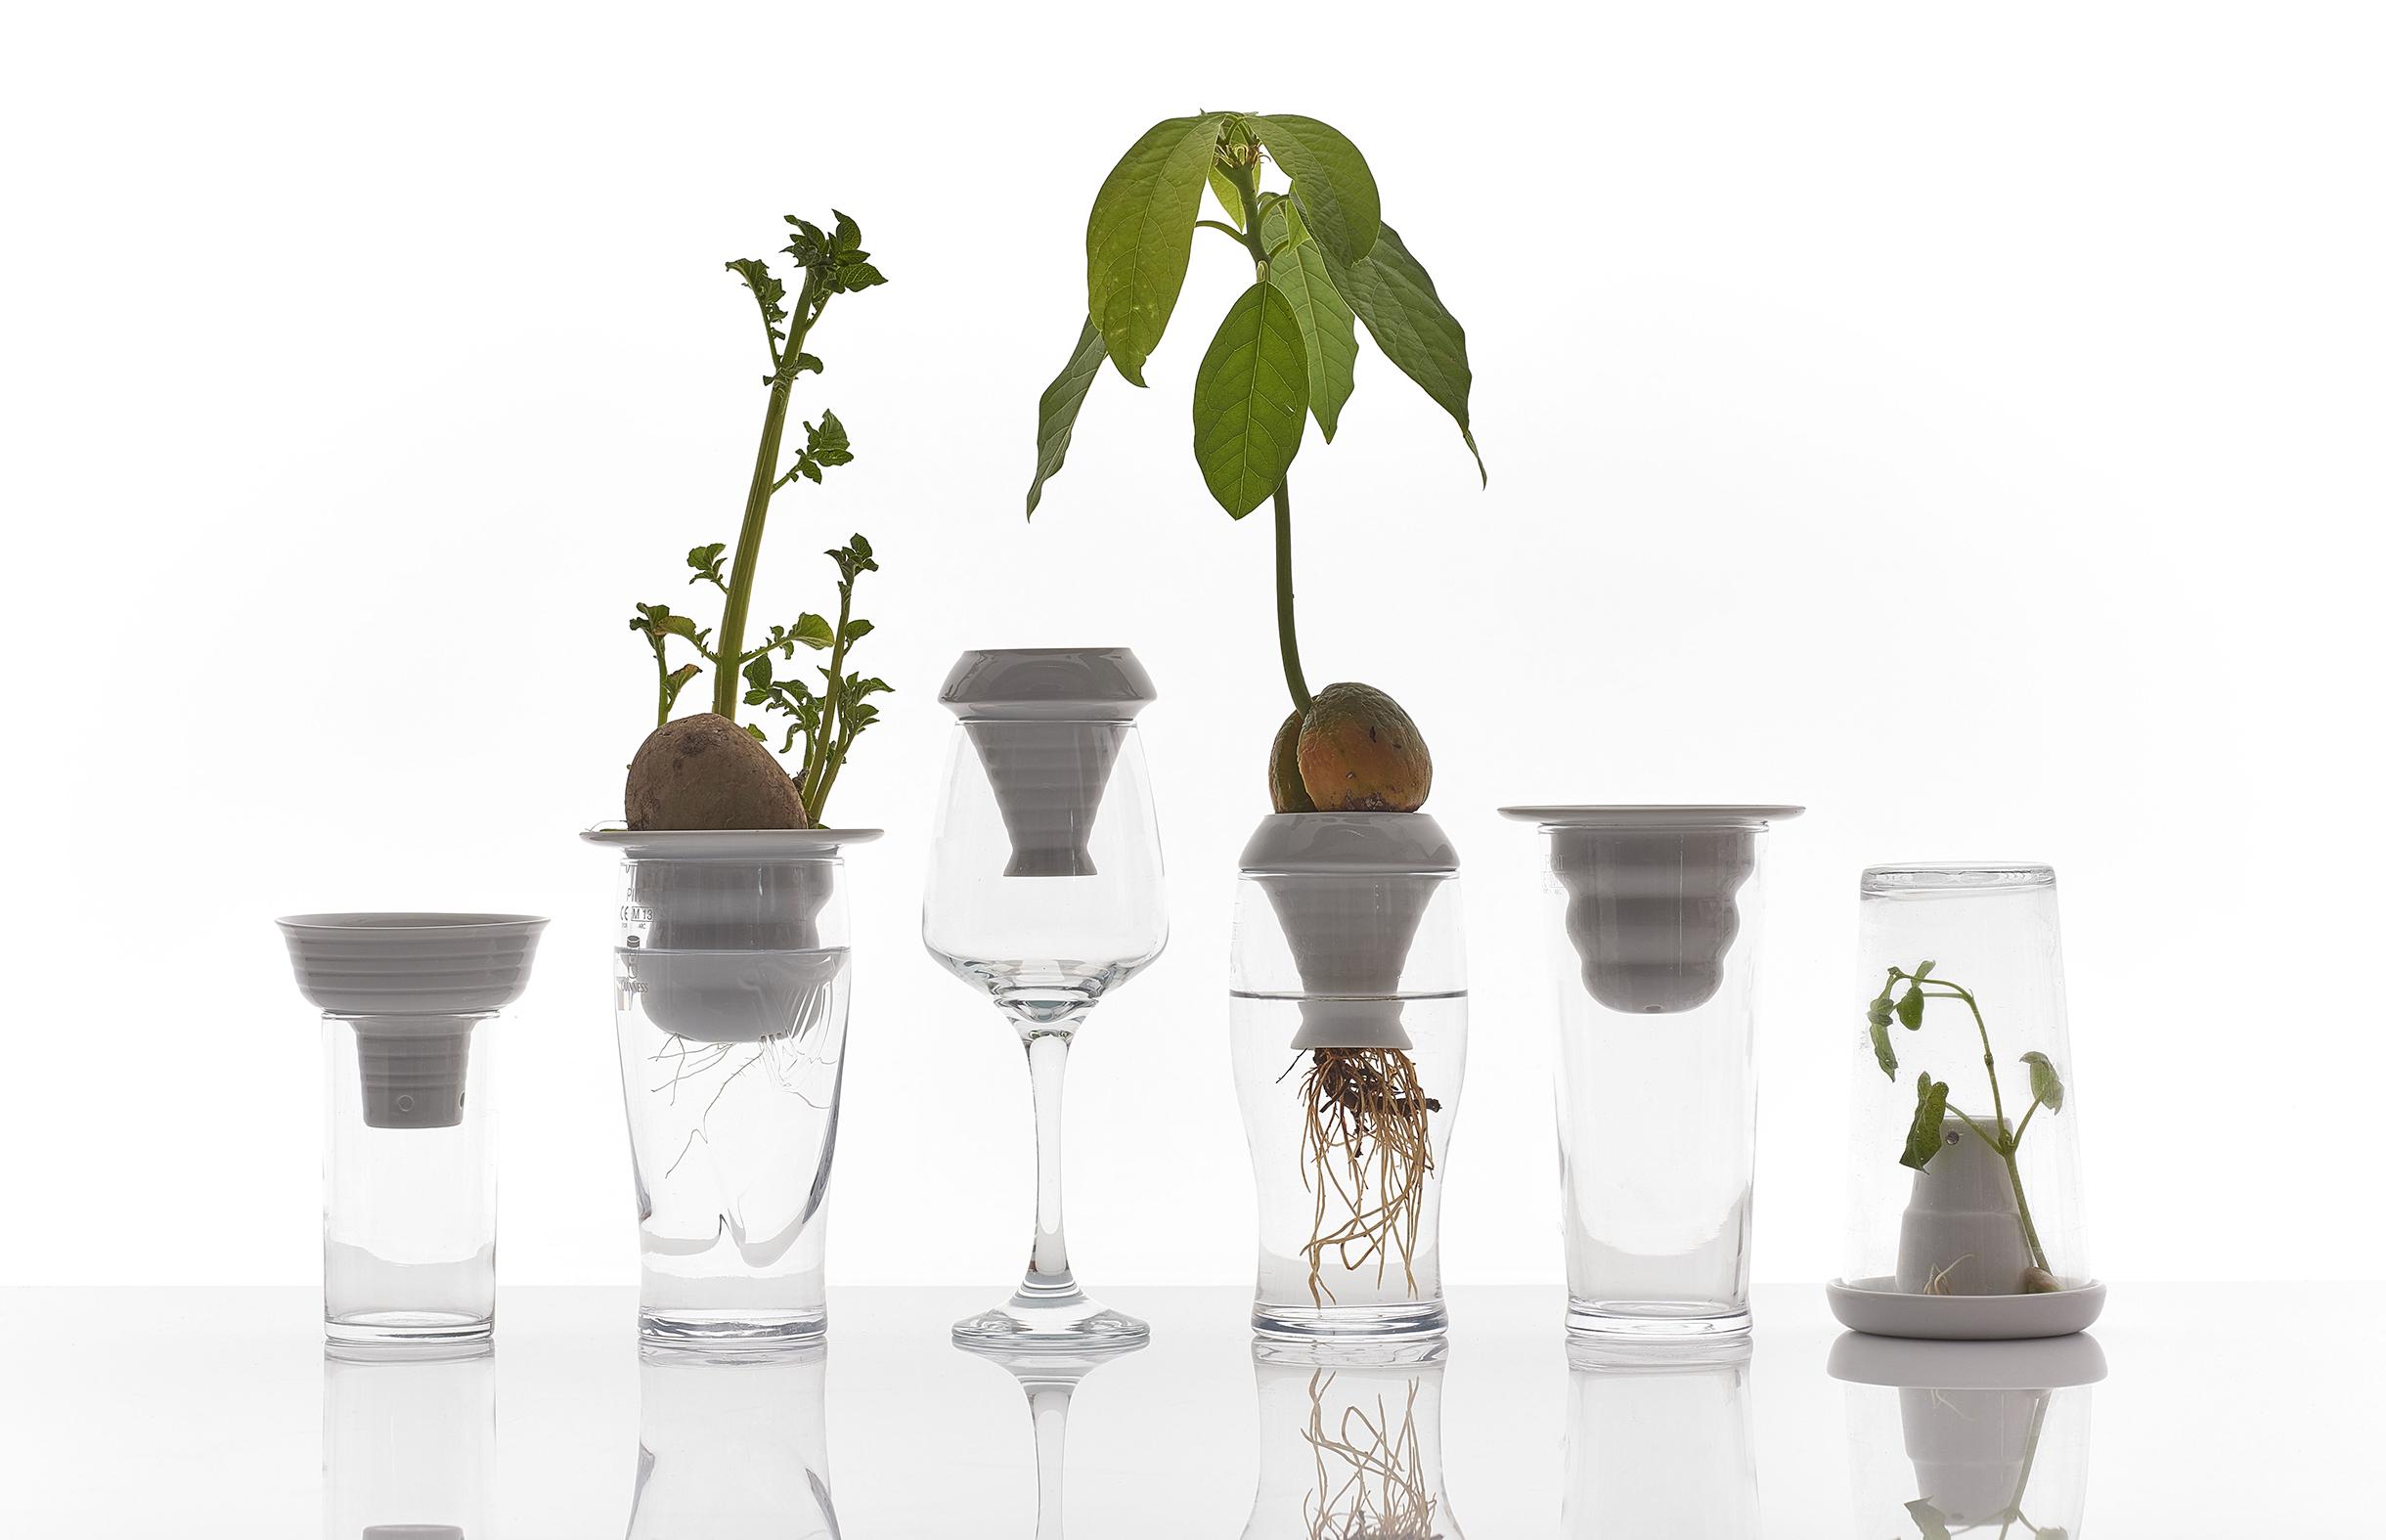 PLANTATION, proj. Alicja Patanowska, fot. S. Deleu (źródło: materiały prasowe organizatora)